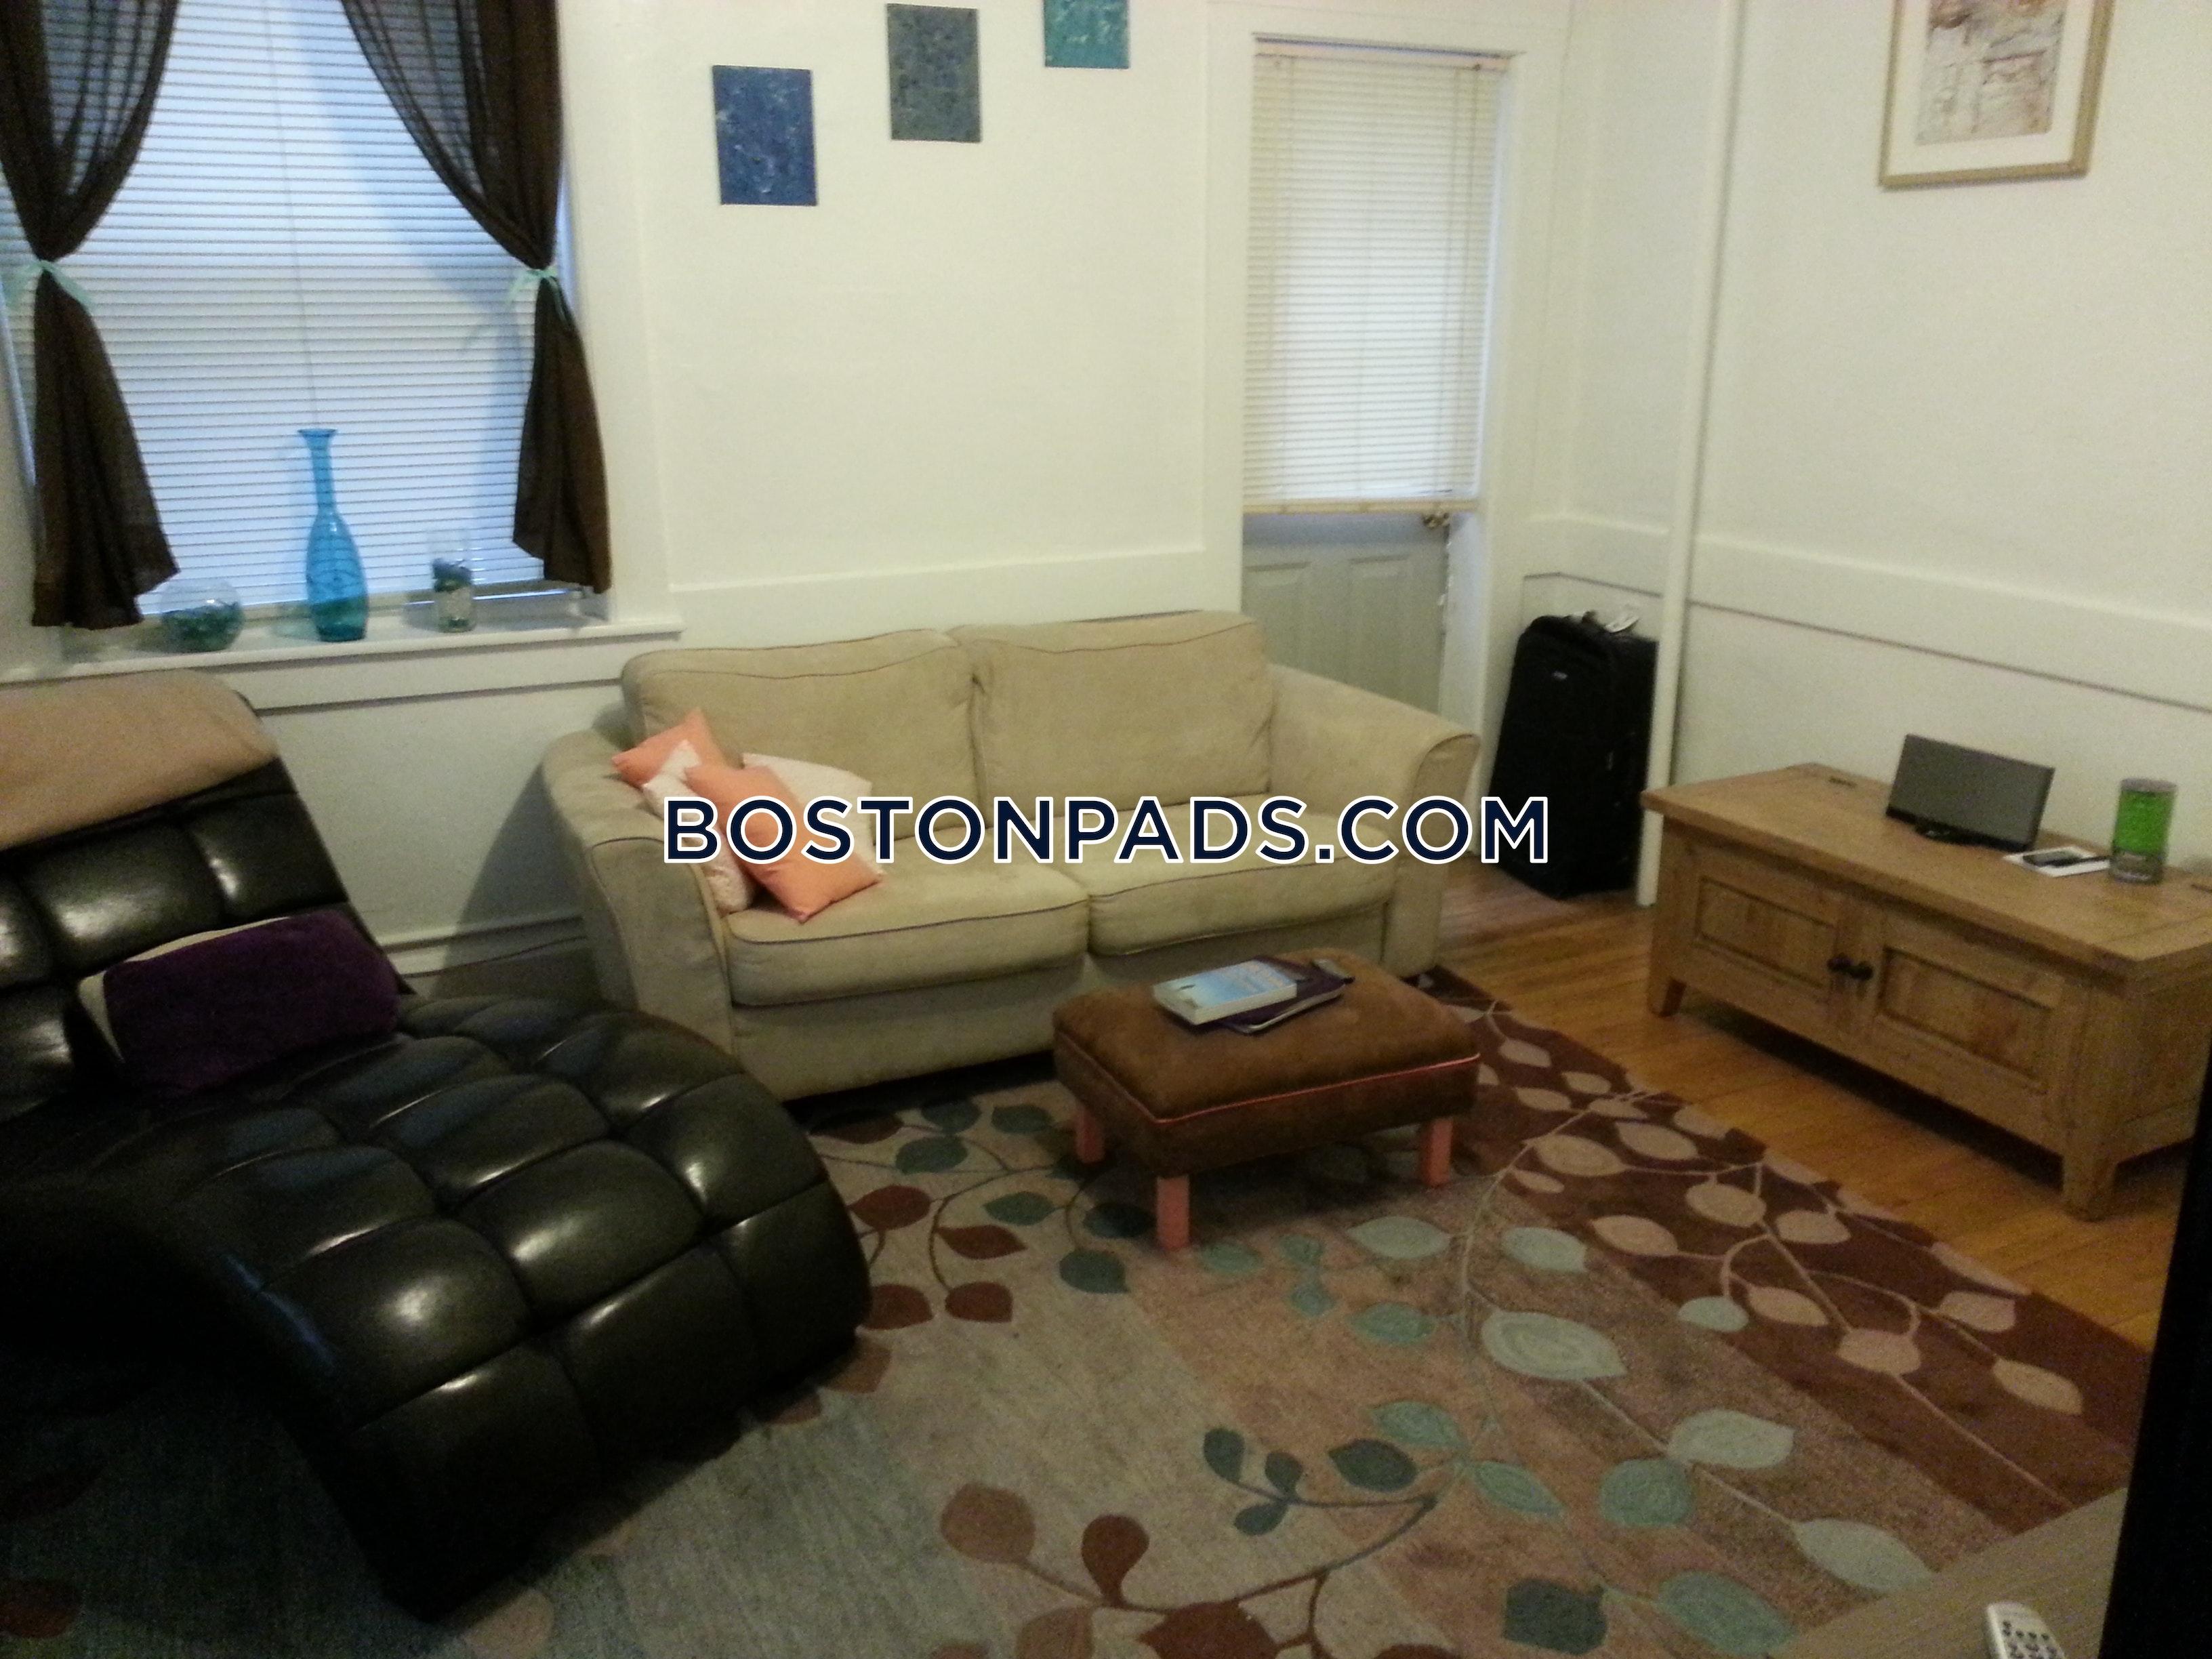 sensational 2 bedroom apartment on endicott street boston north